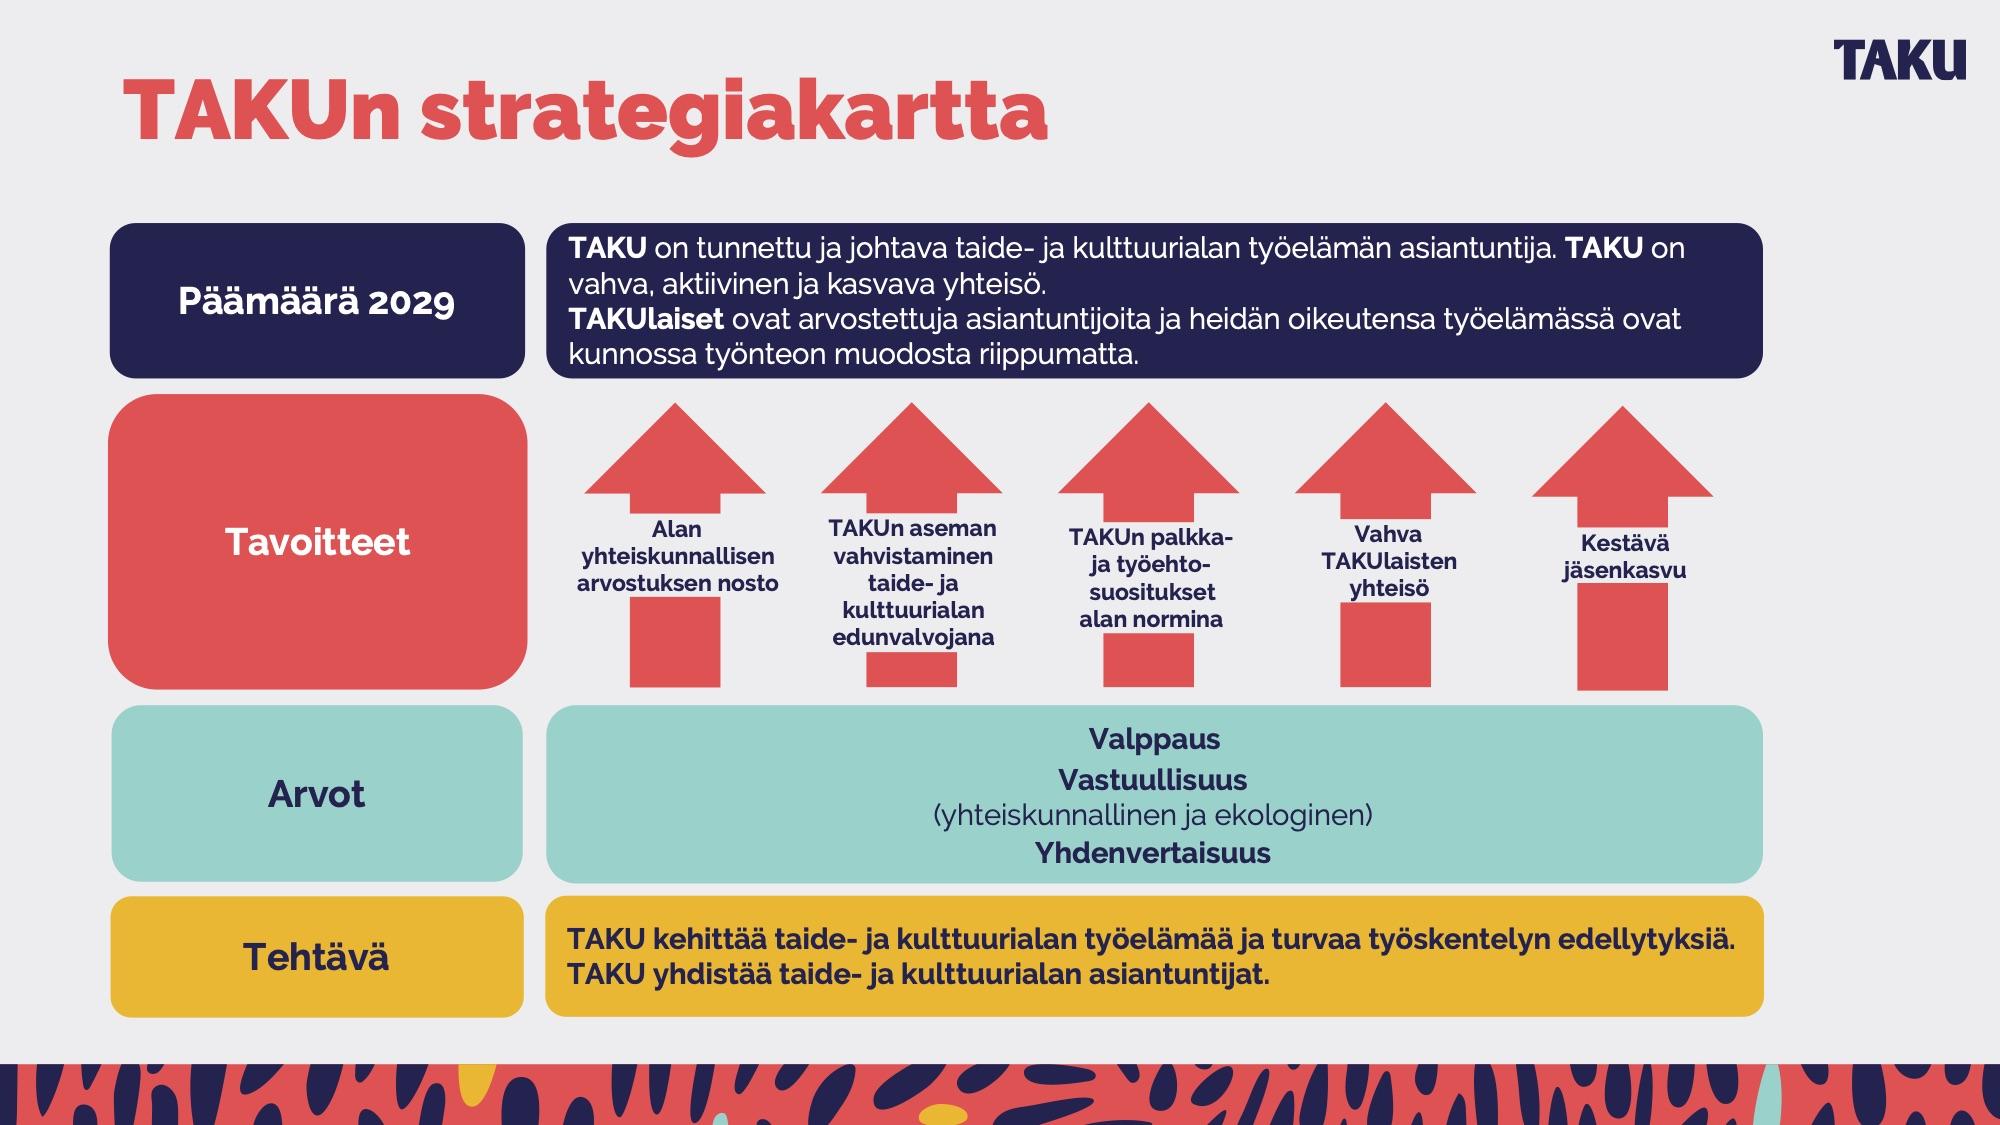 TAKUn strategiakartta 2020–2029